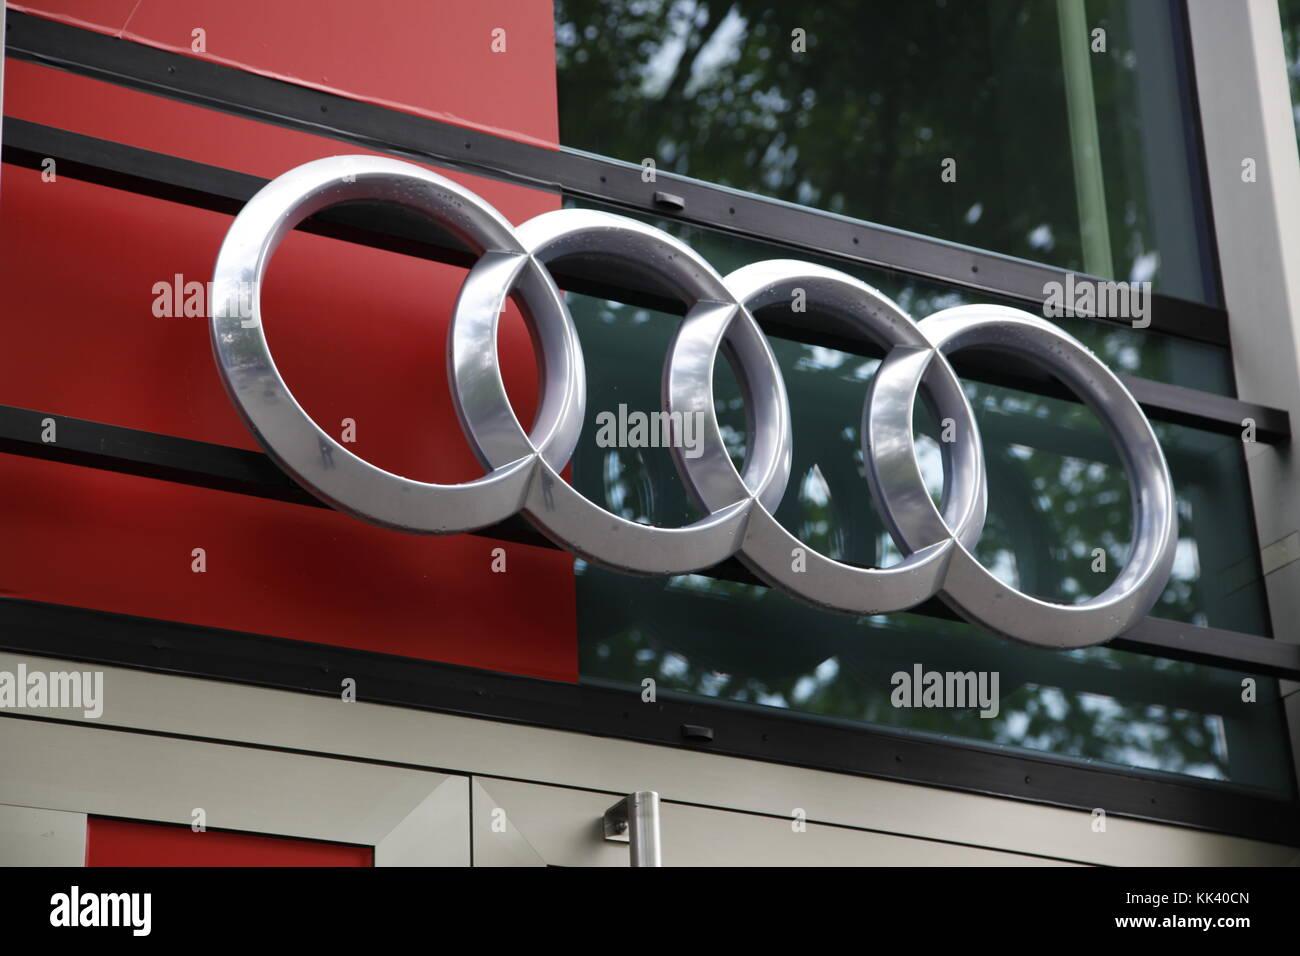 Audi label - Stock Image